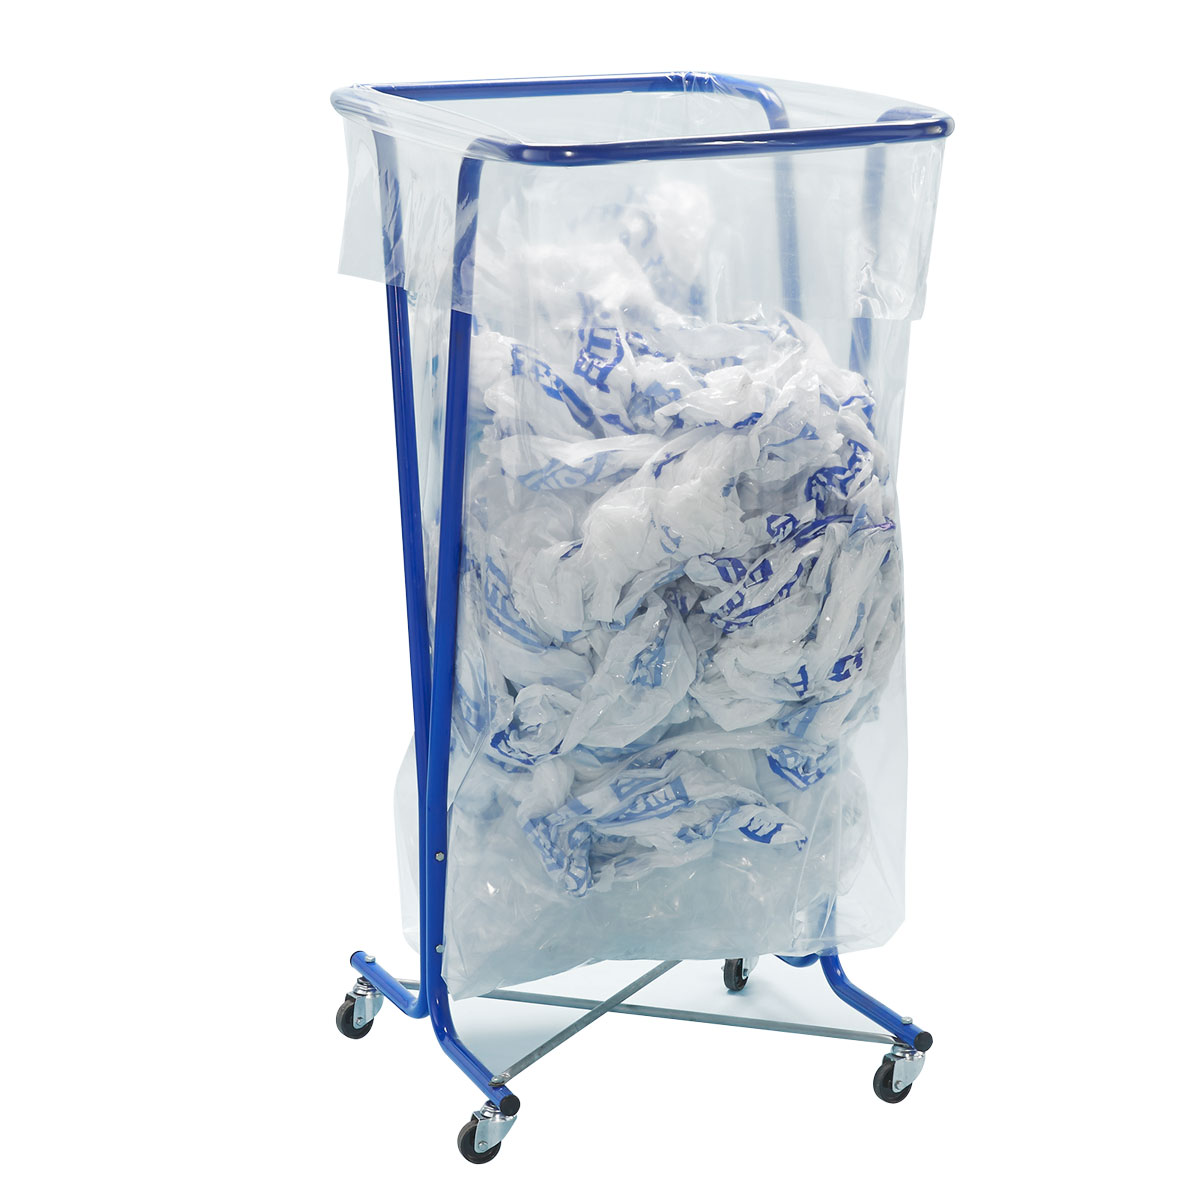 Soportes para bolsas de basura de grandes con o sin ruedas. Disset Odiseo